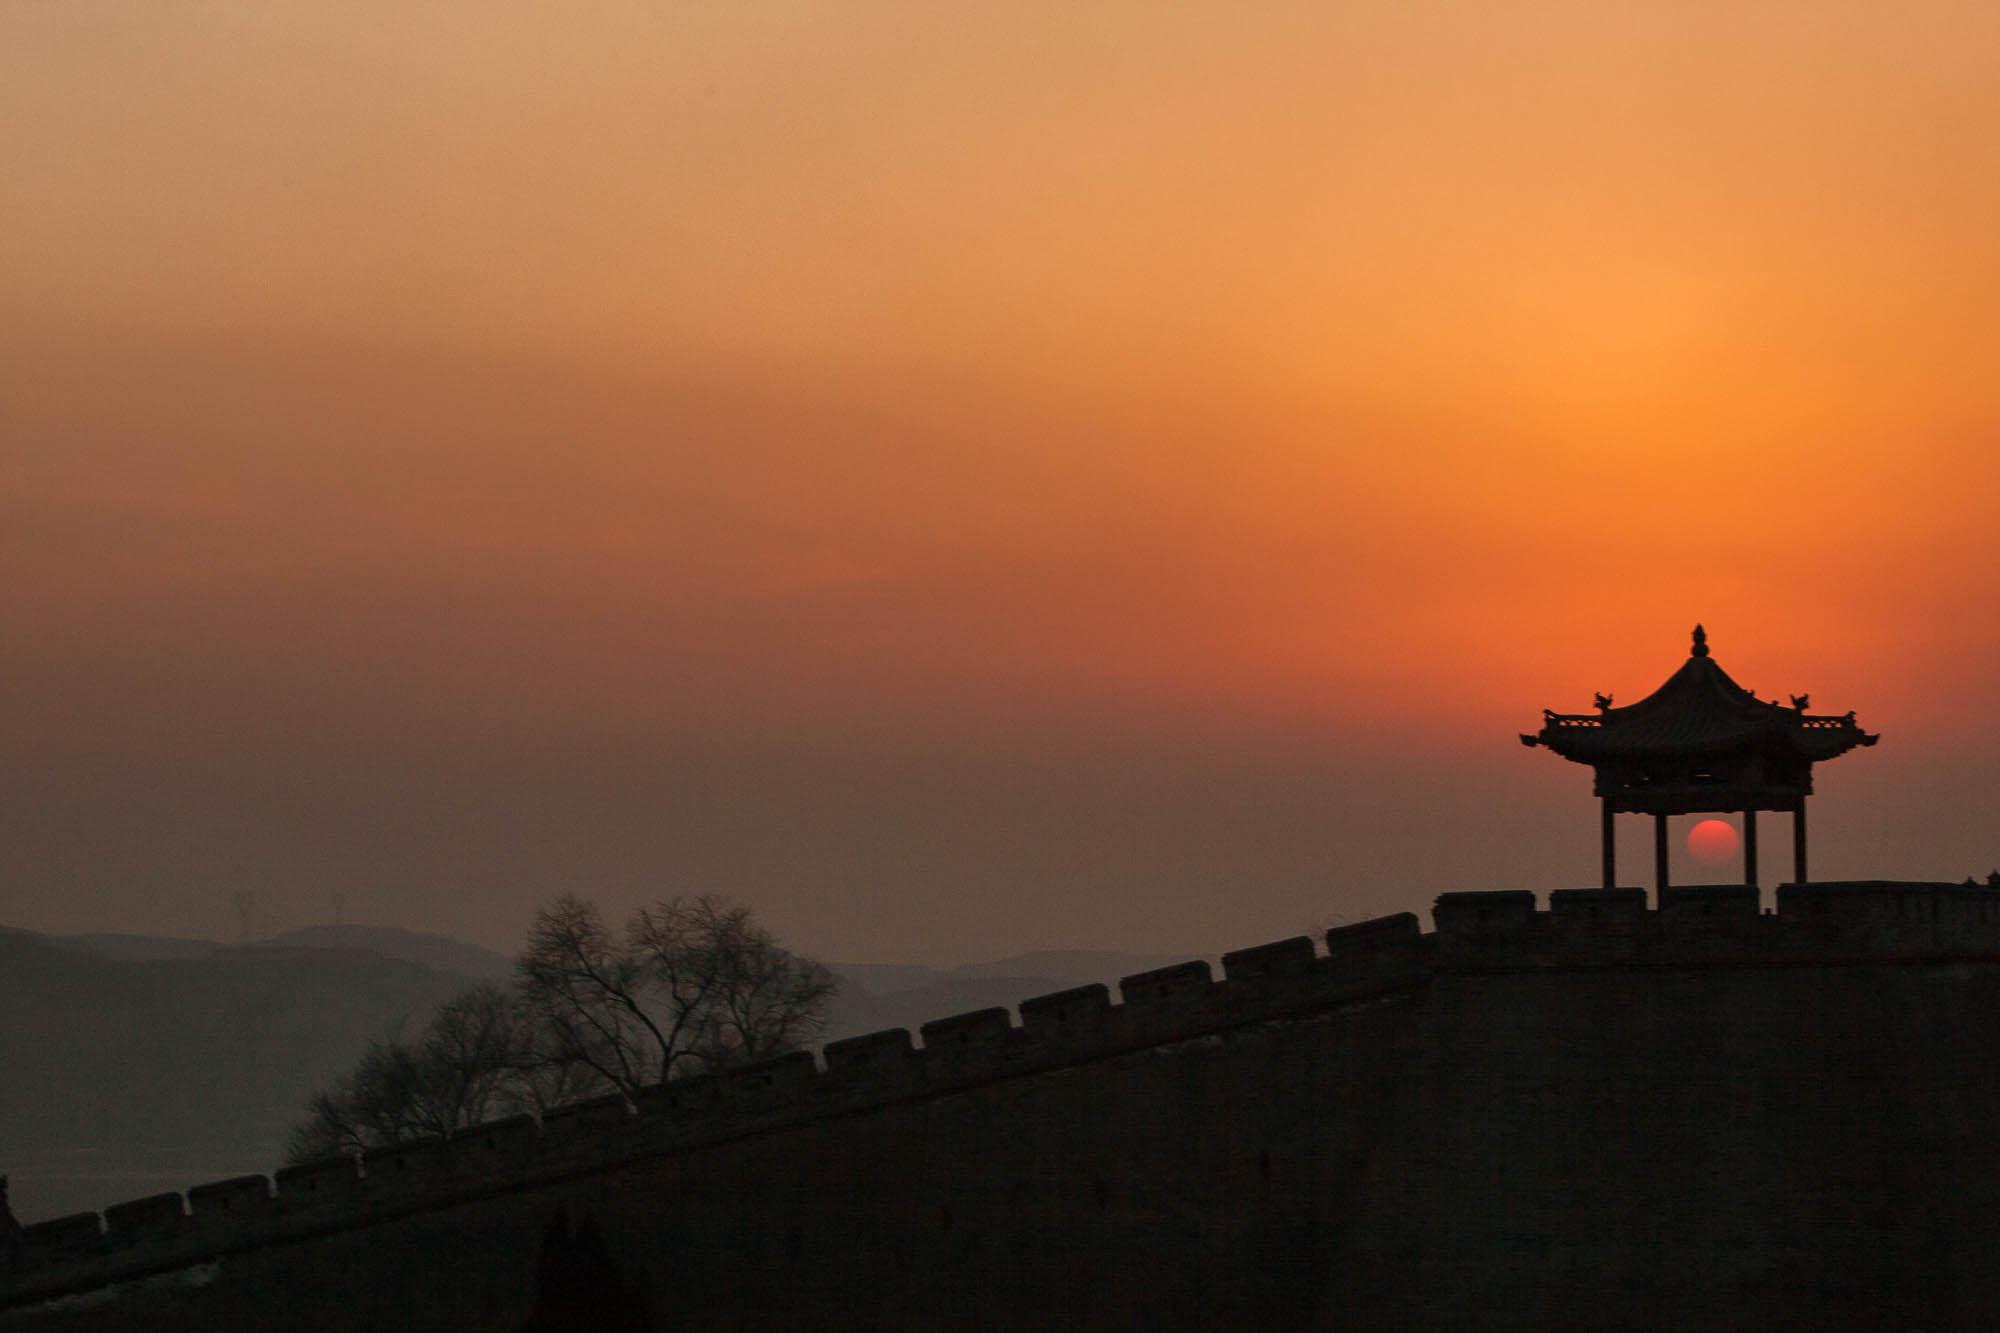 sunset over Wang Family Courtyard